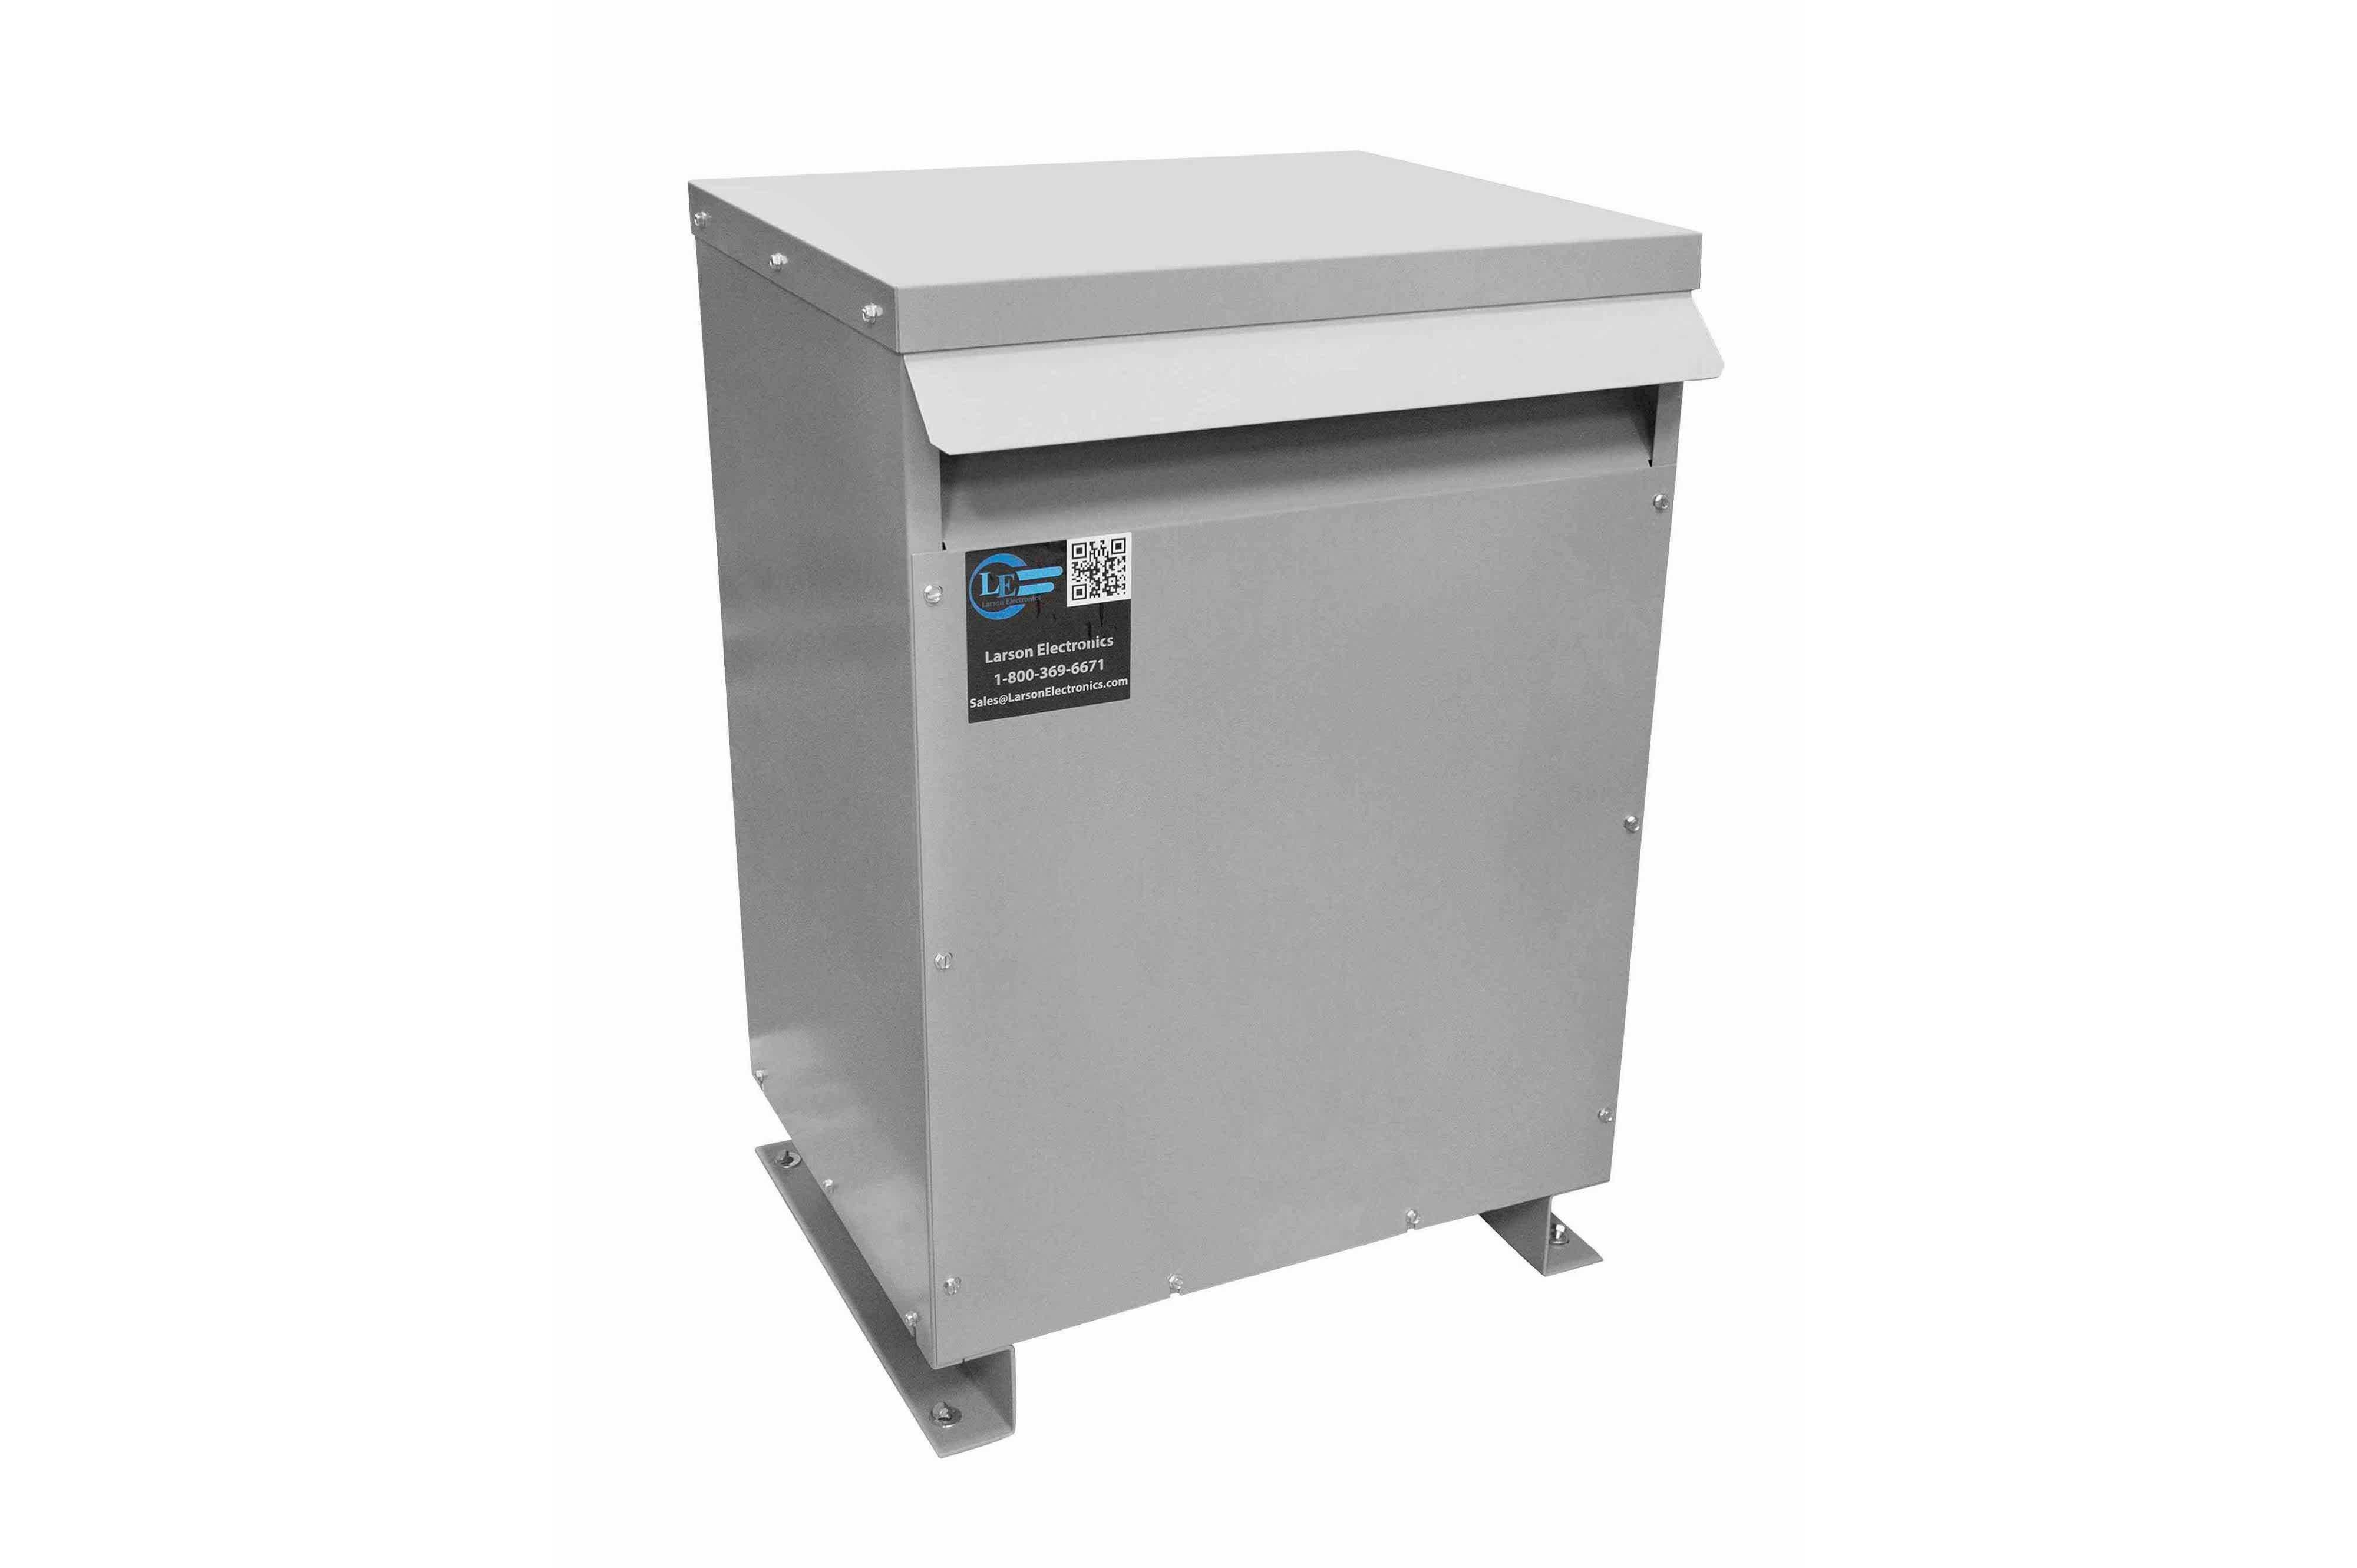 1000 kVA 3PH Isolation Transformer, 480V Wye Primary, 480Y/277 Wye-N Secondary, N3R, Ventilated, 60 Hz